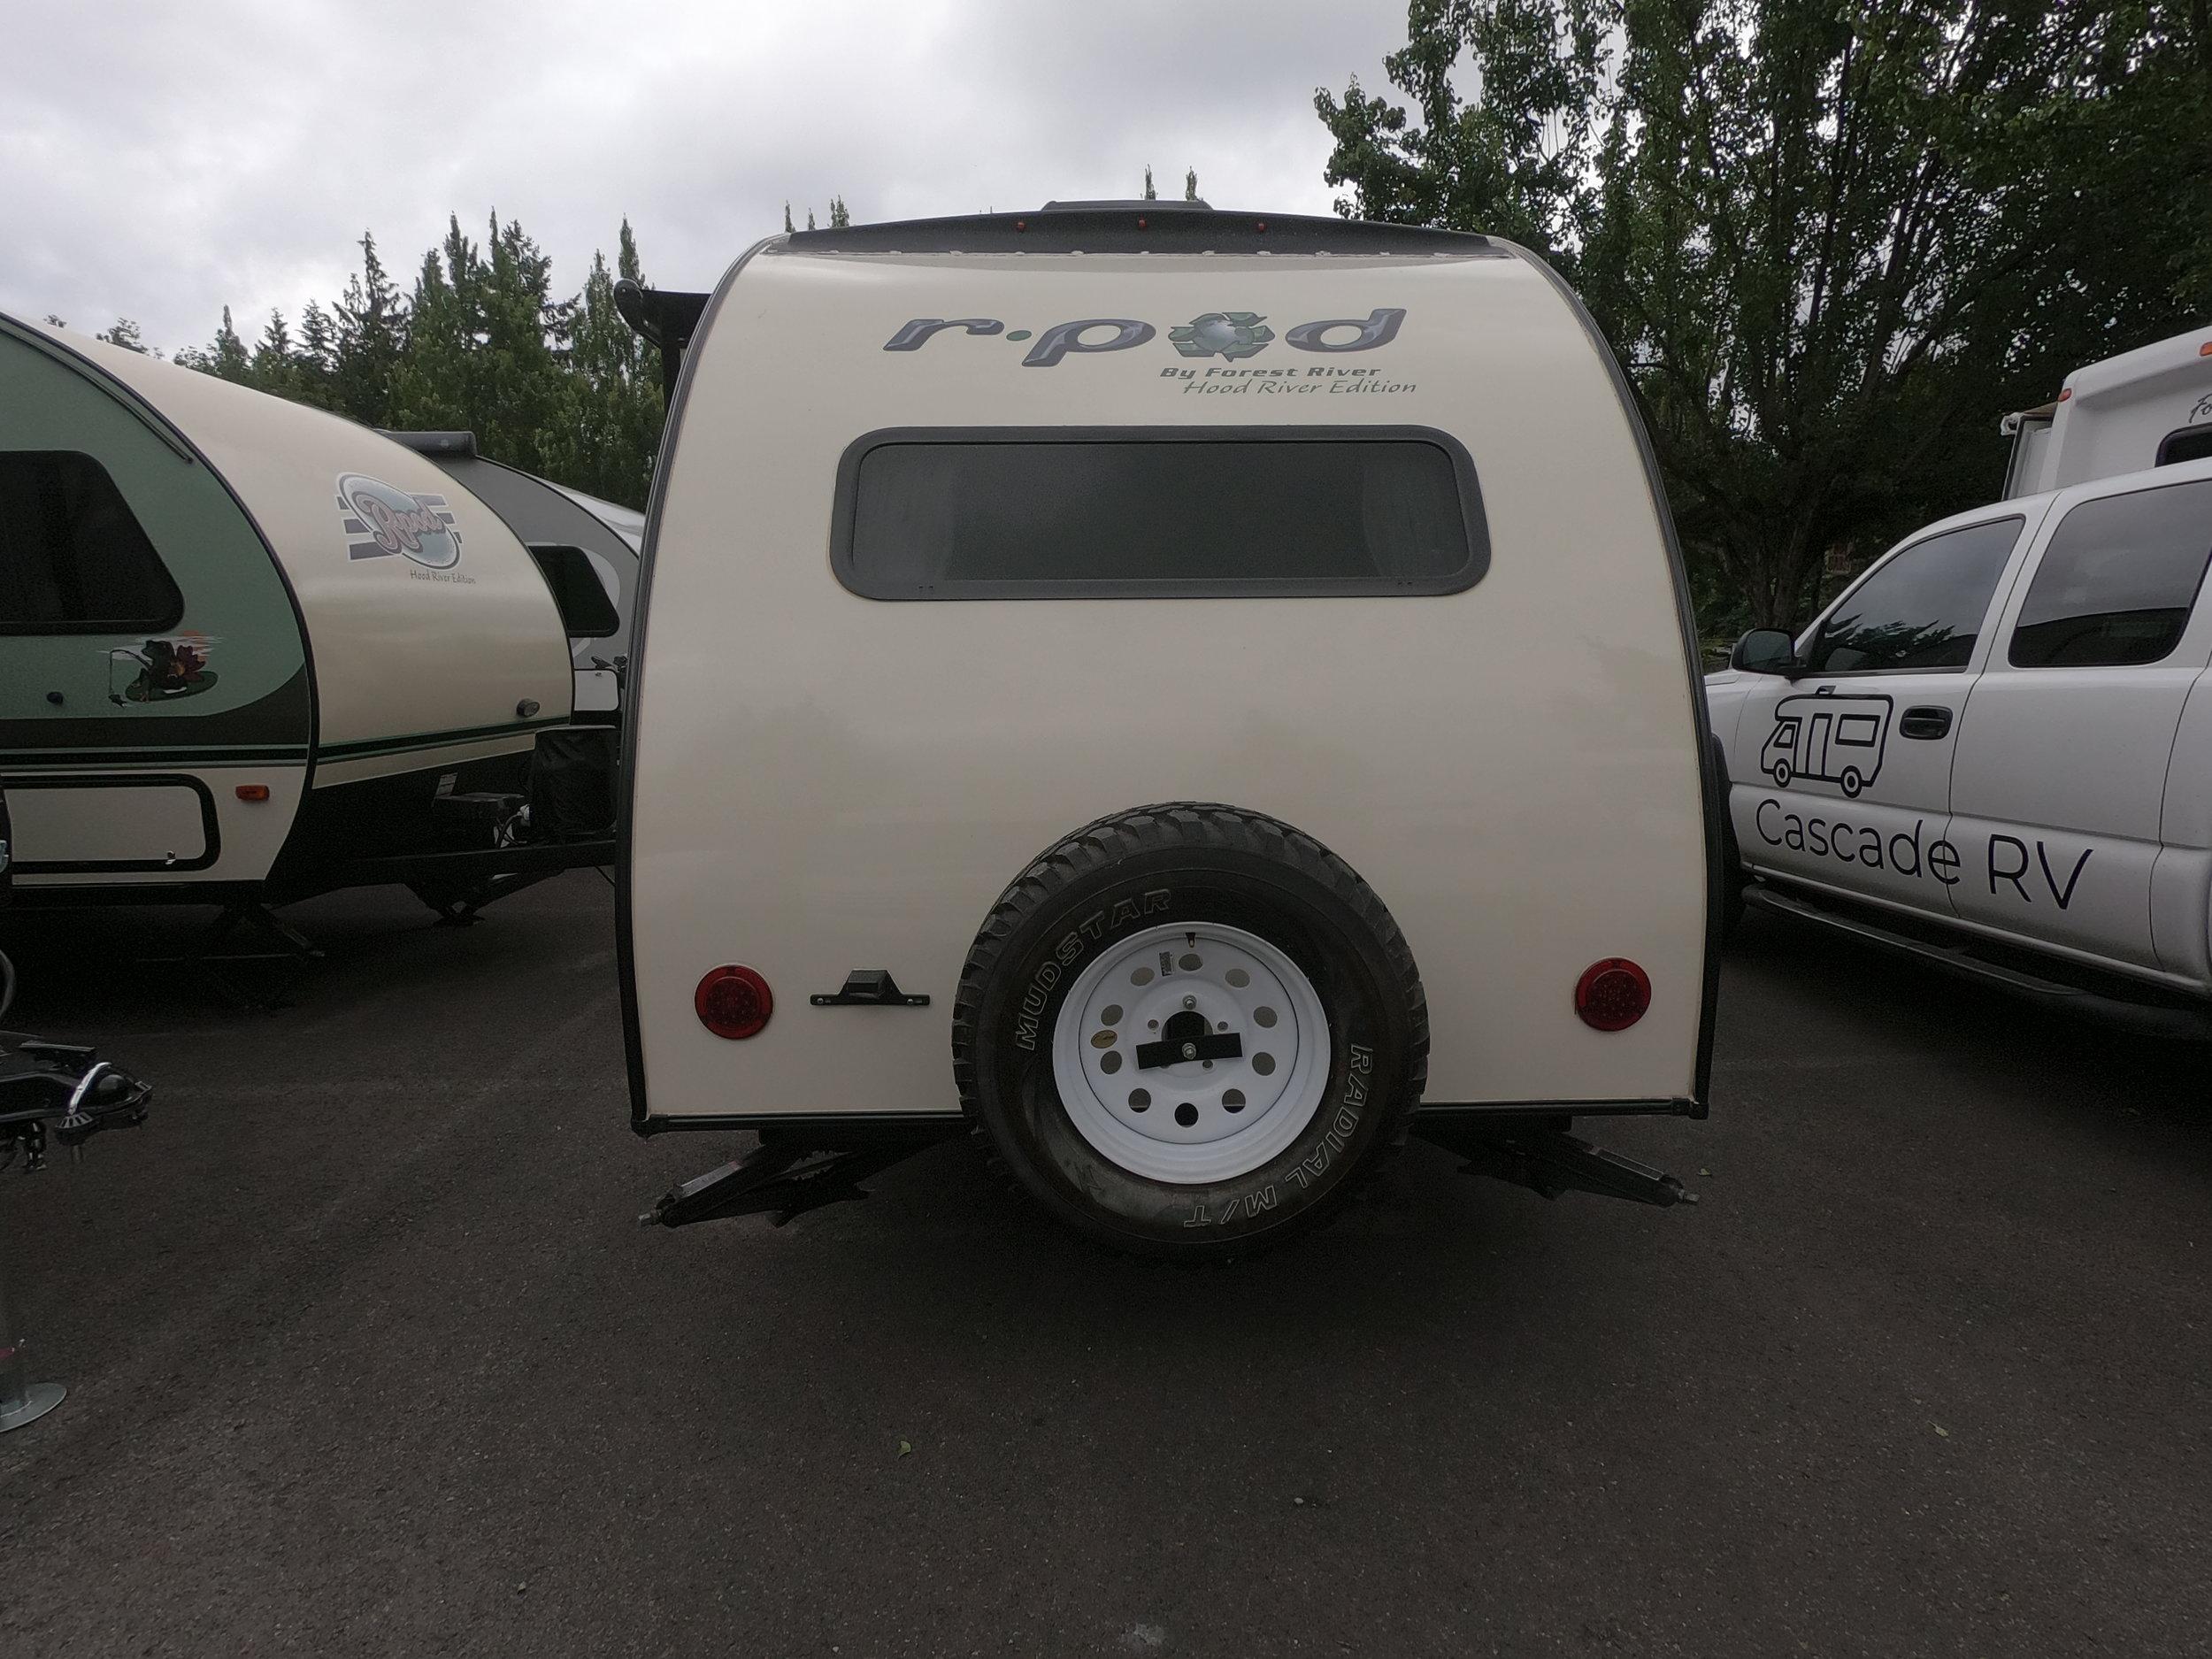 GOPR0954.JPG